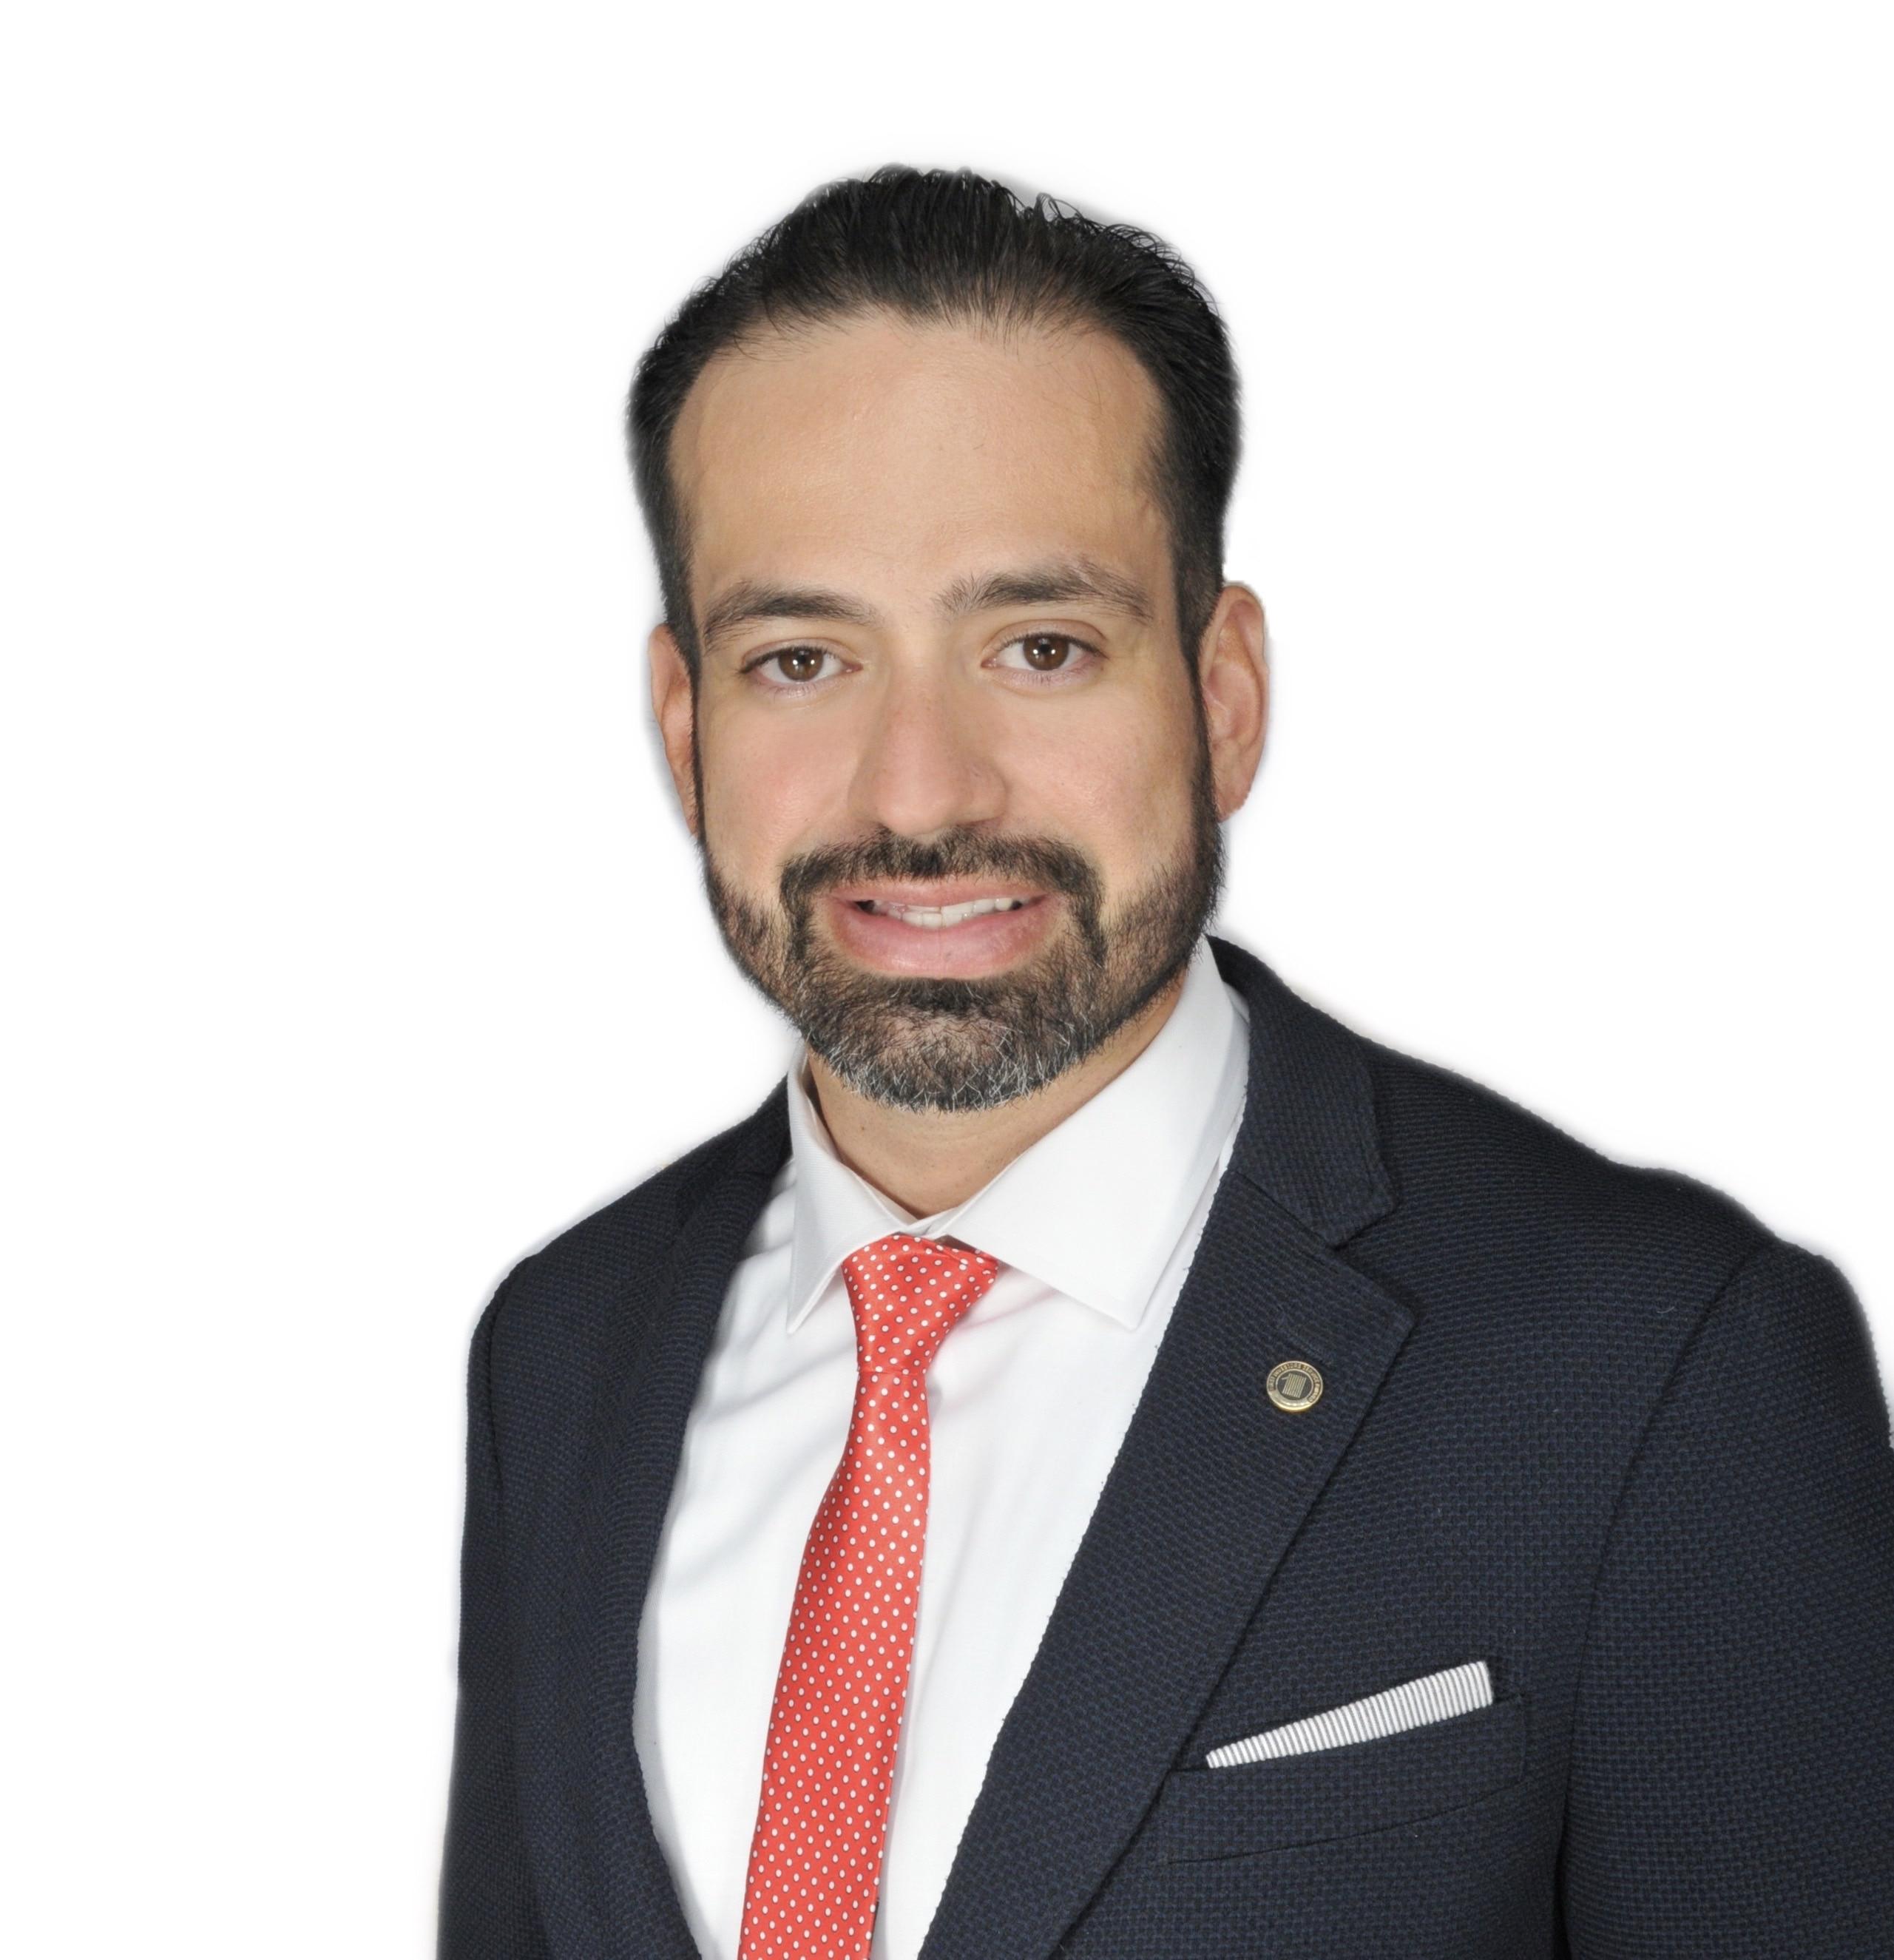 JUAN PABLO CARDONA  Your Financial Professional & Insurance Agent